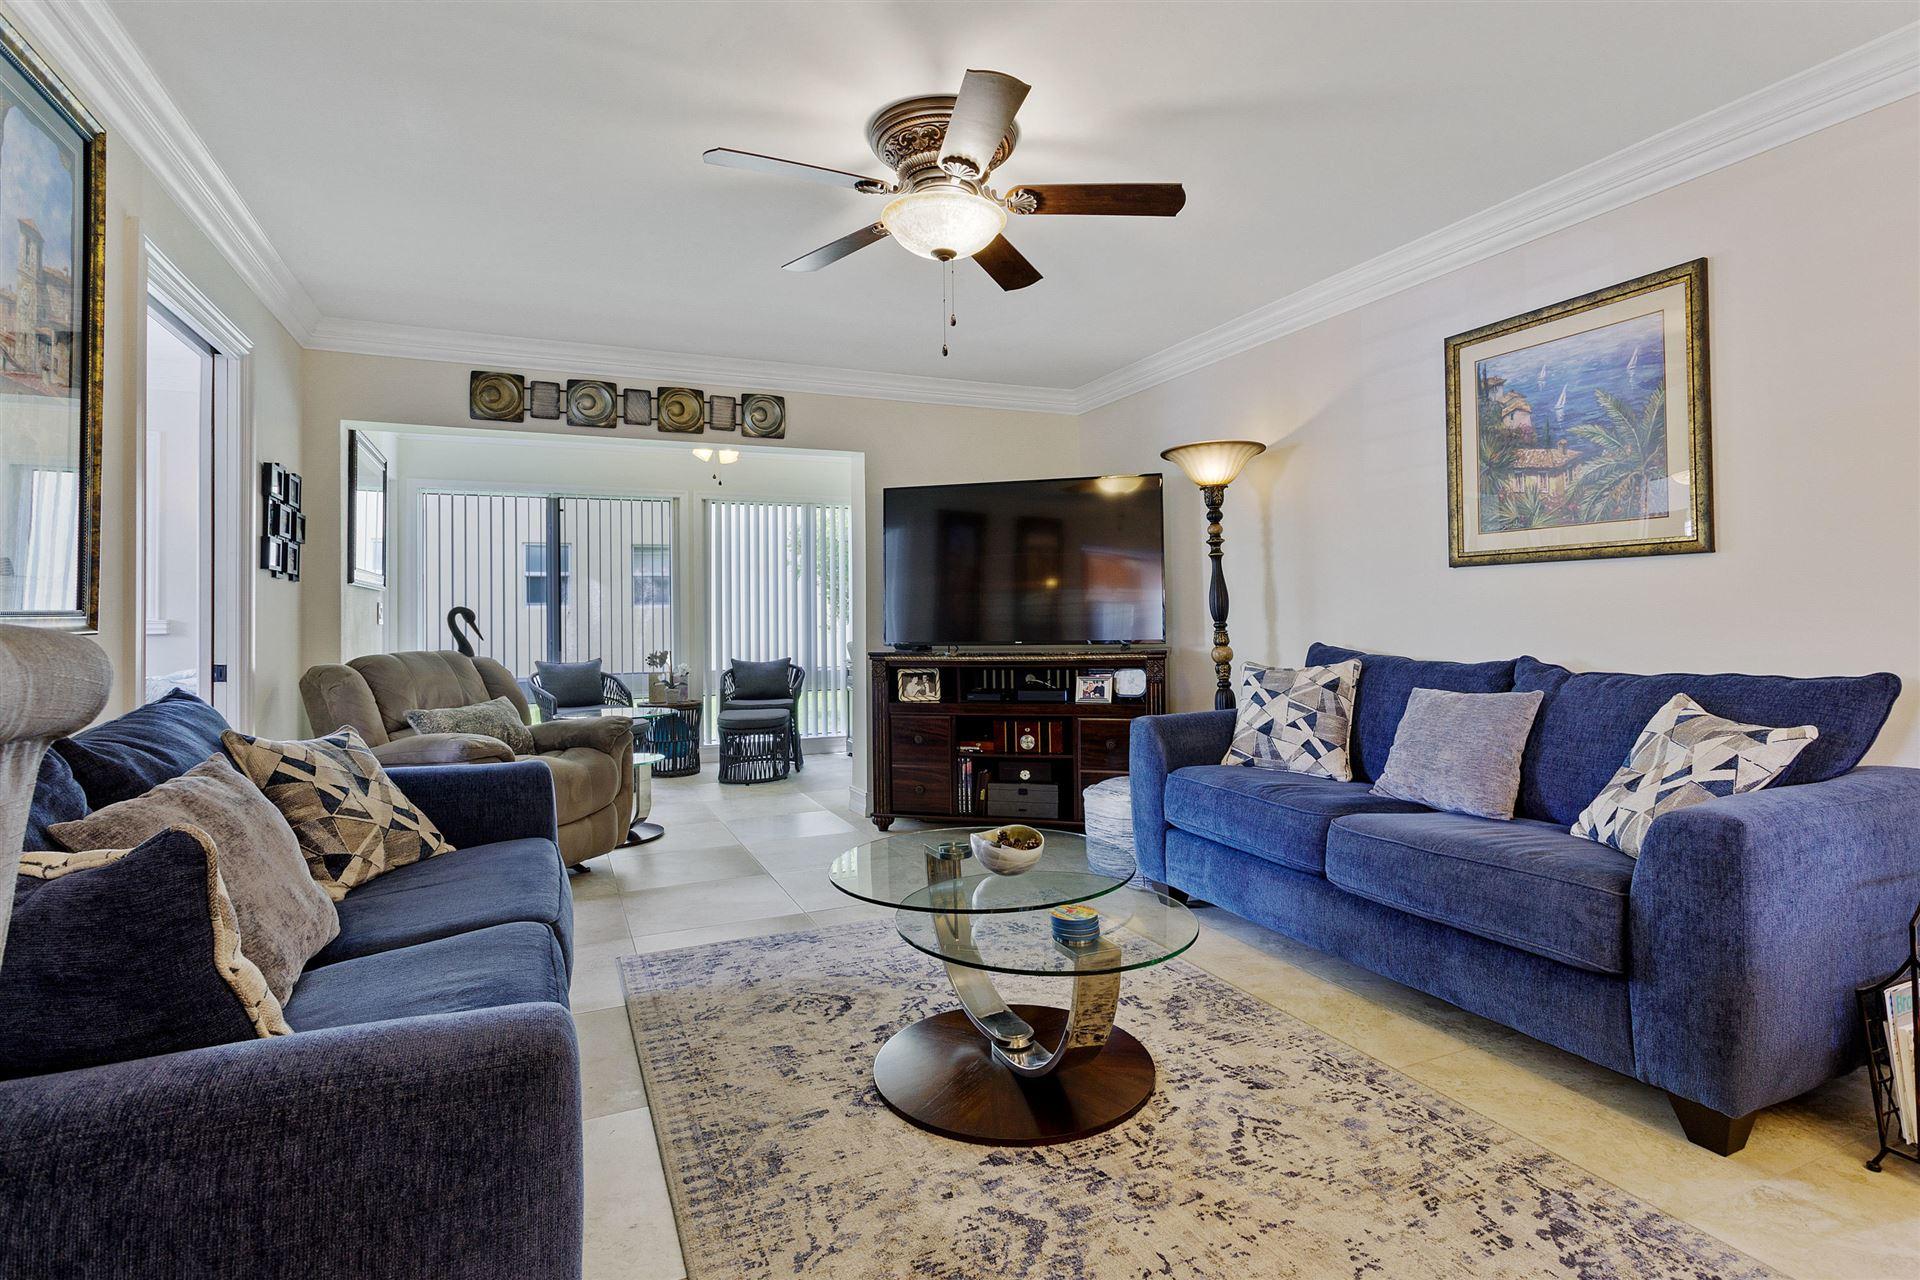 Photo of 15 Colonial Club Drive #100, Boynton Beach, FL 33435 (MLS # RX-10715124)